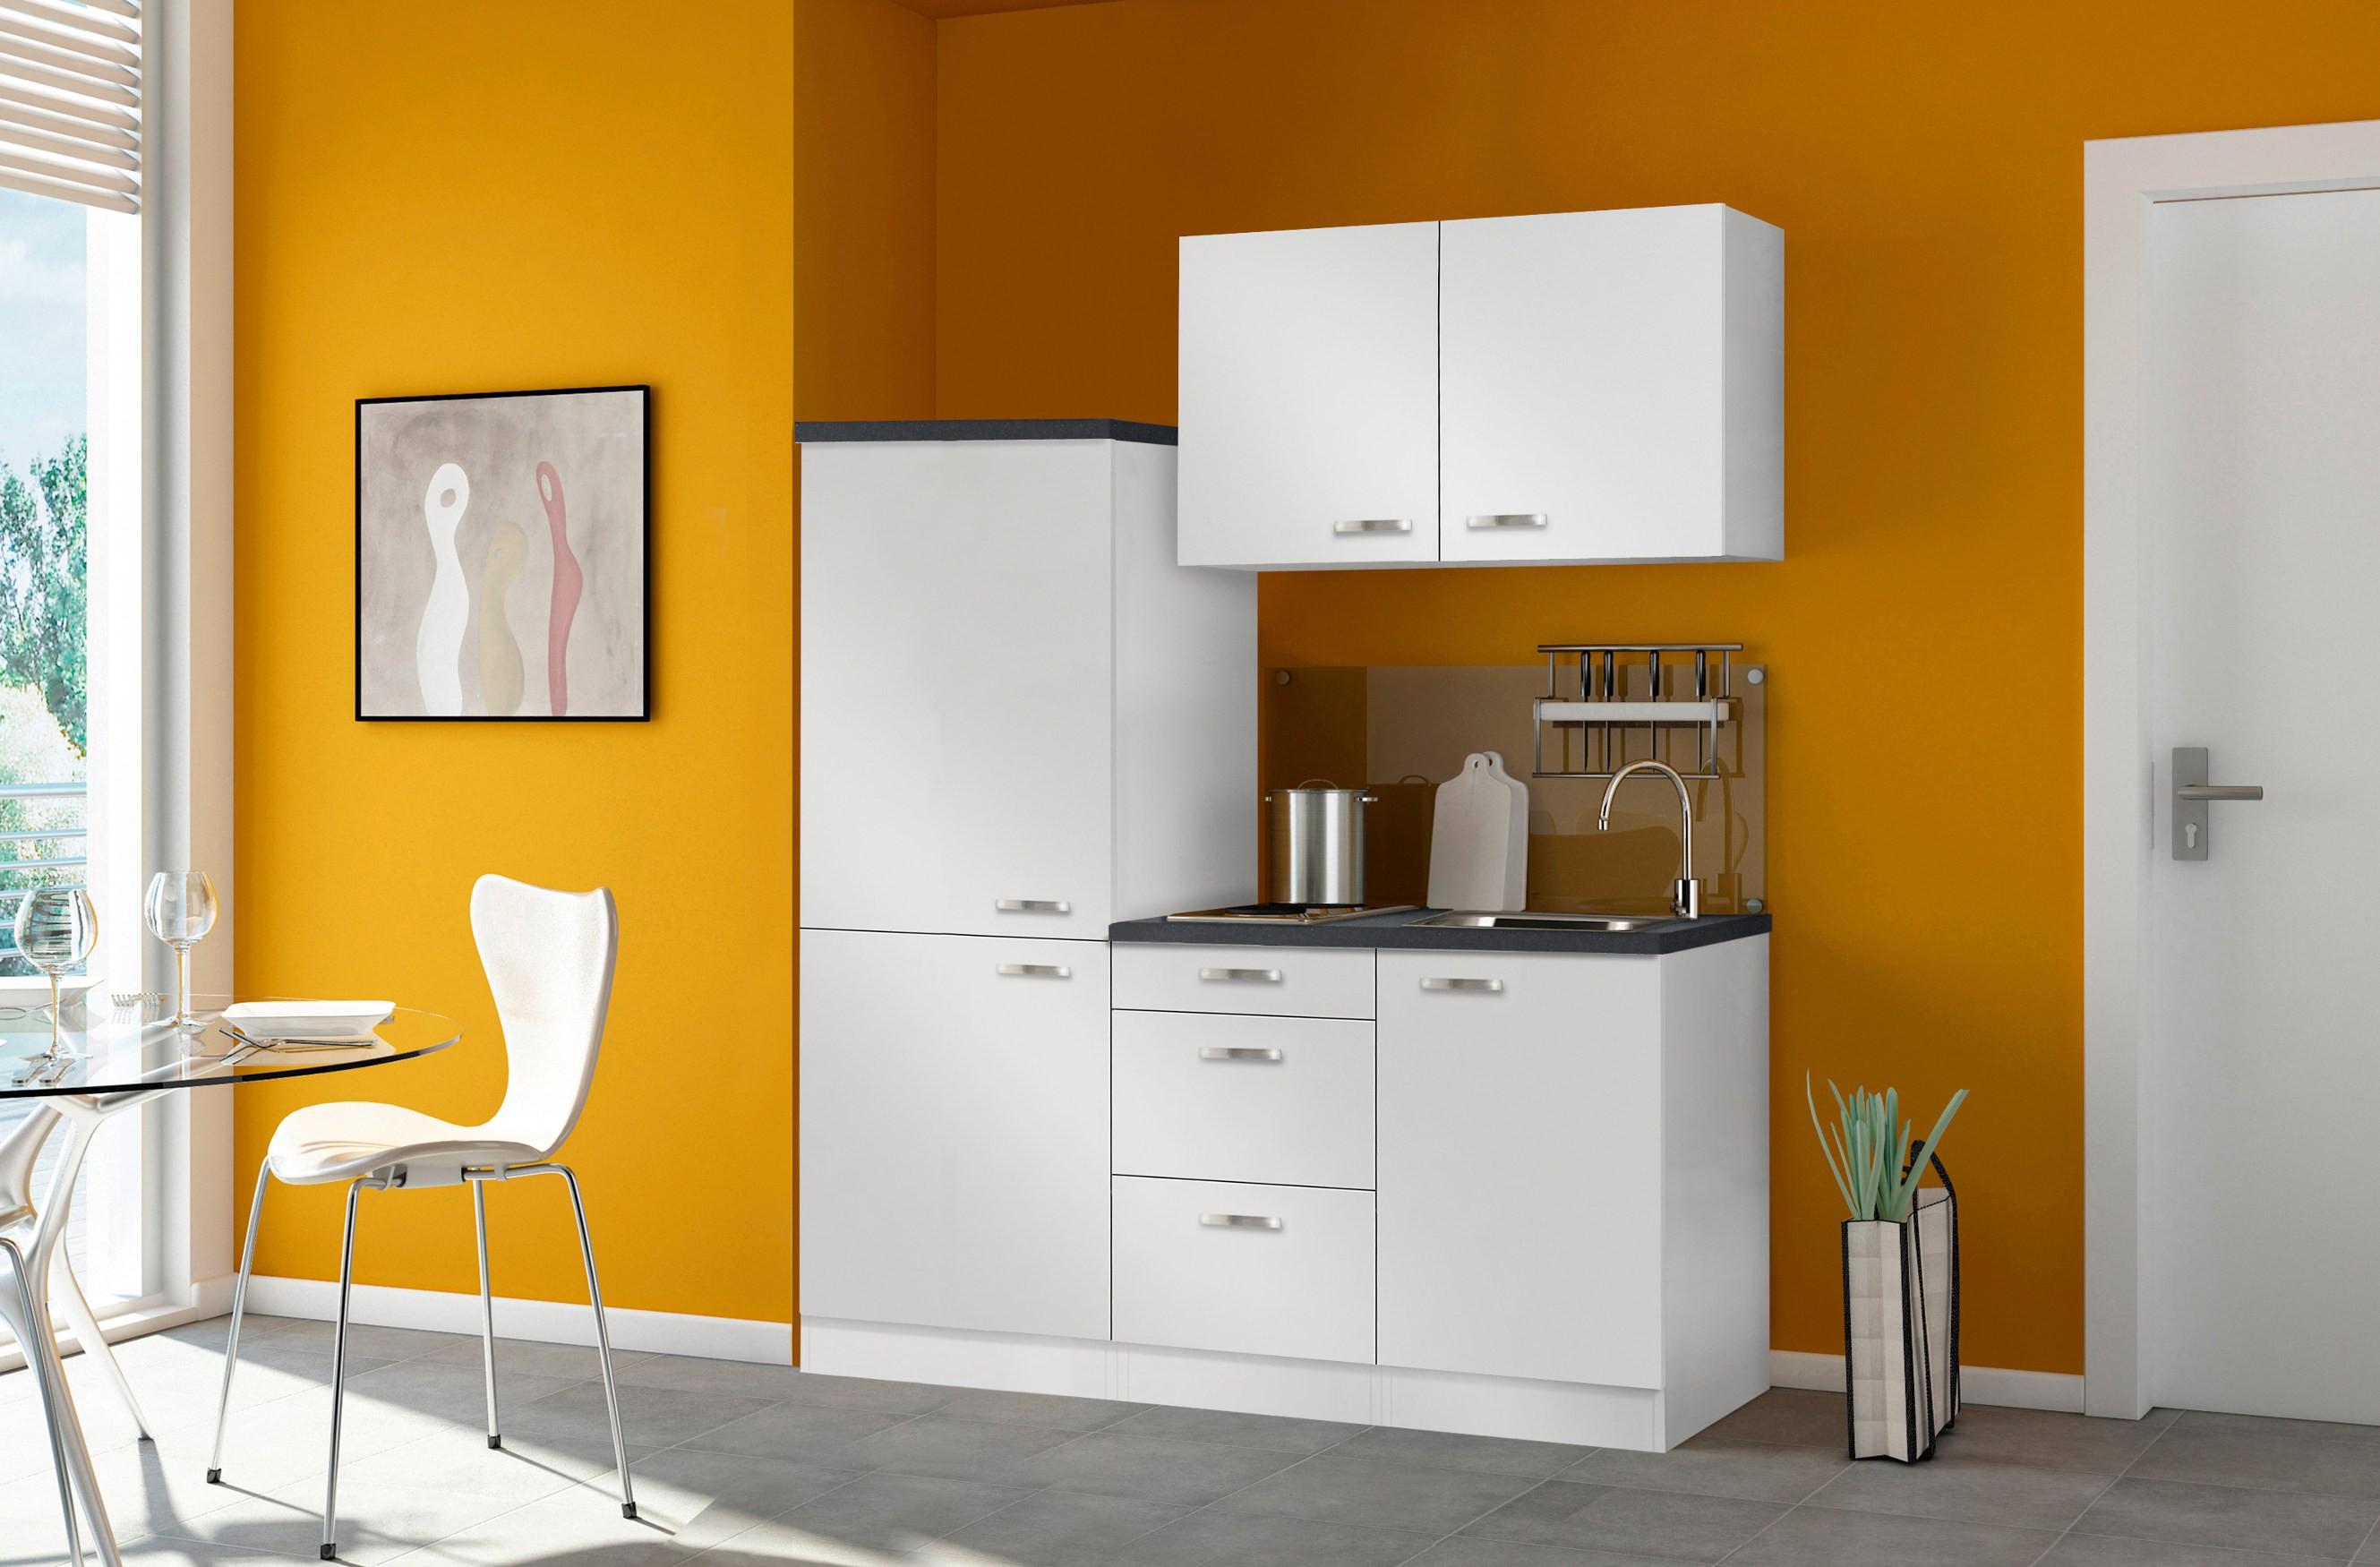 singlek che granada mit elektro kochfeld breite 160 cm wei k che singlek chen. Black Bedroom Furniture Sets. Home Design Ideas